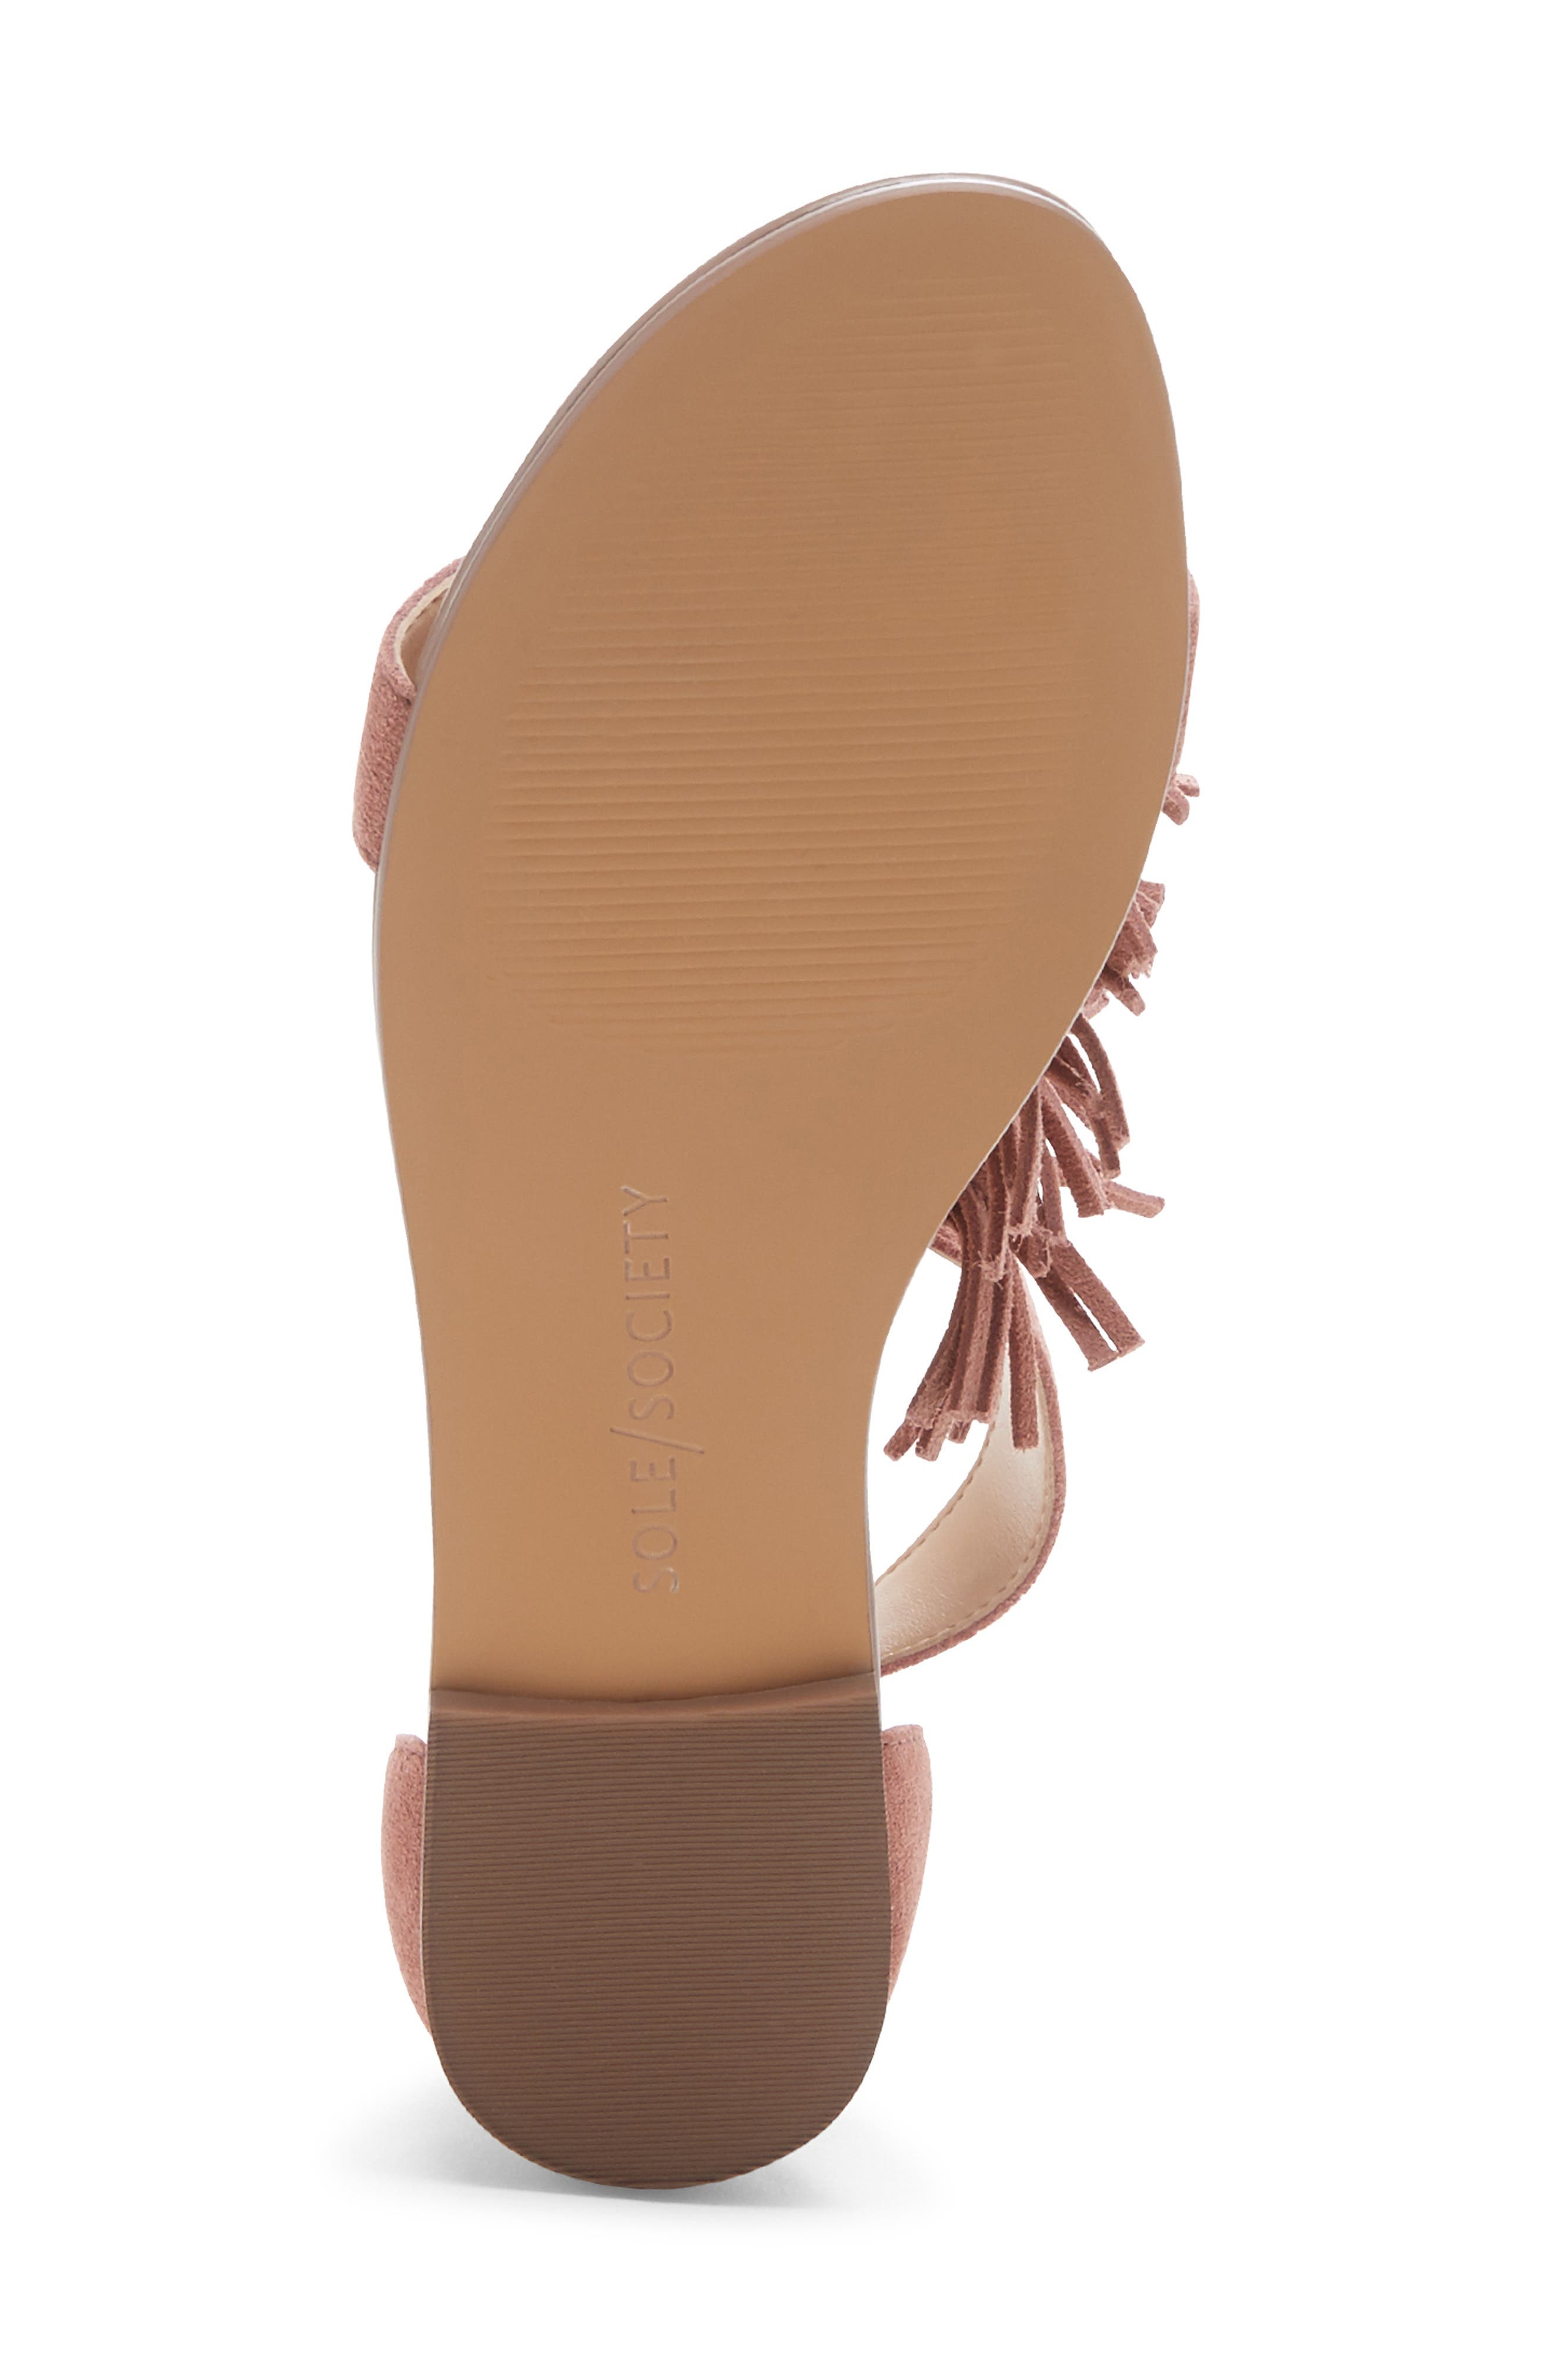 SOLE SOCIETY, 'Koa' Fringe T-Strap Flat Sandal, Alternate thumbnail 6, color, MOD MAUVE SUEDE